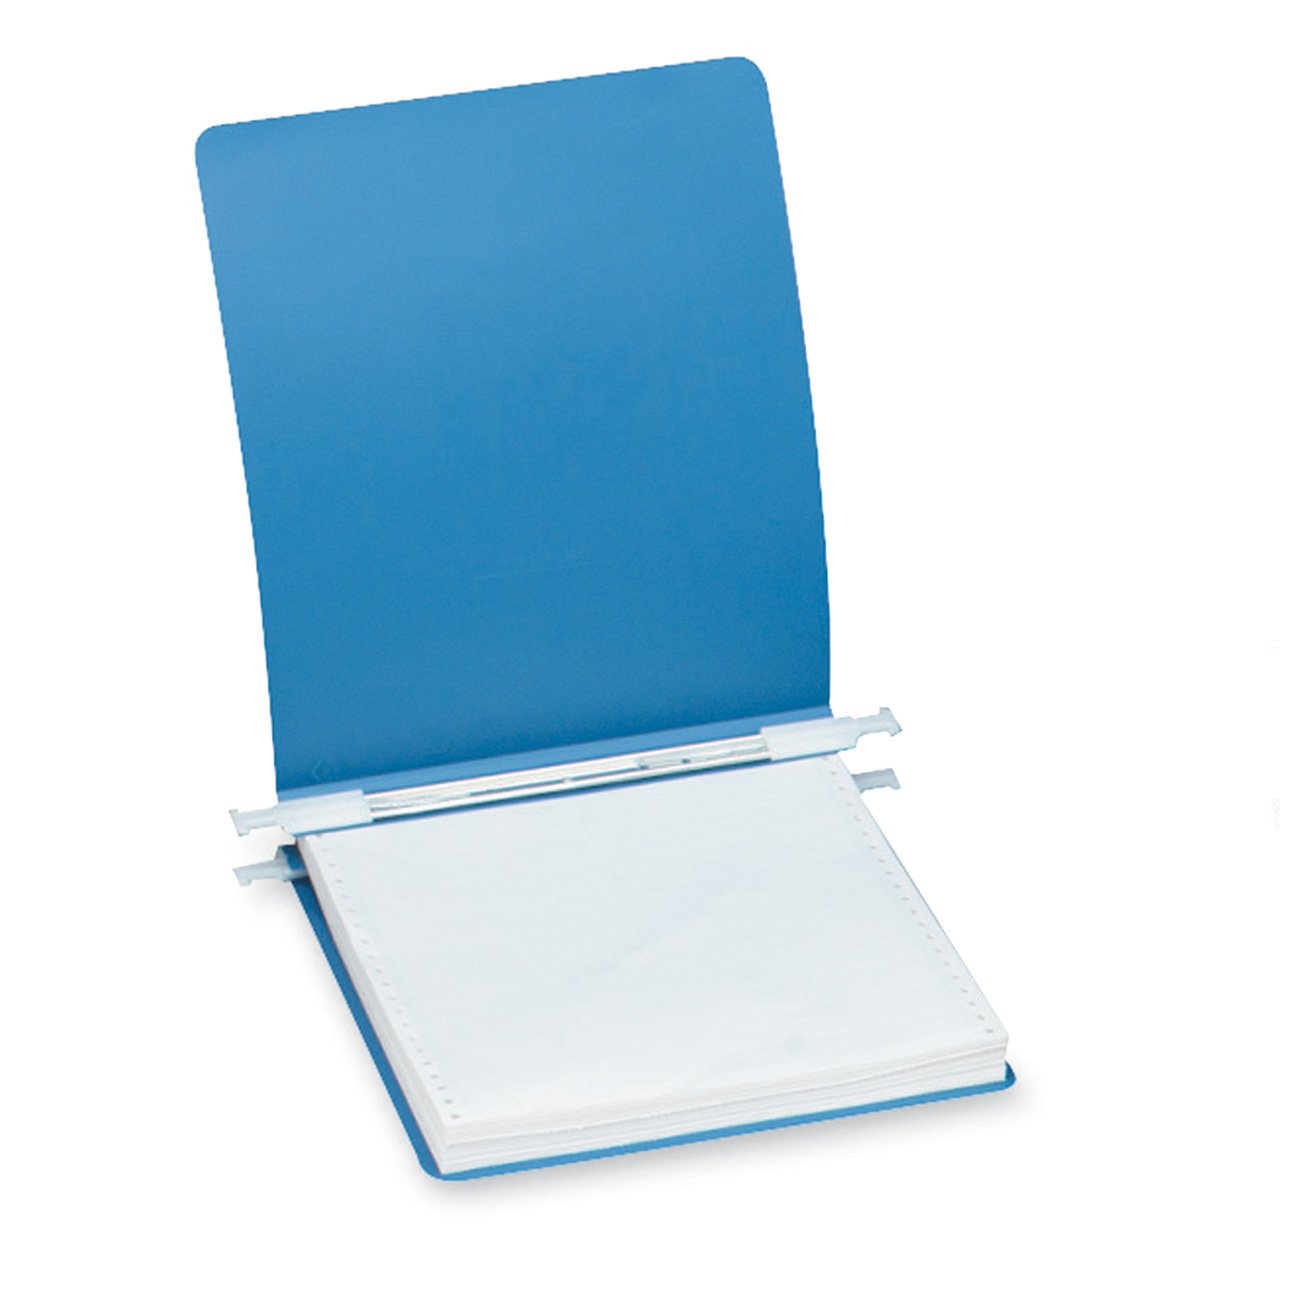 AccoHide Poly Hanging Data Binder, Unburst, 9.5 x 11-Inch Sheet Size, 9-Inch Centre, Blue 56003